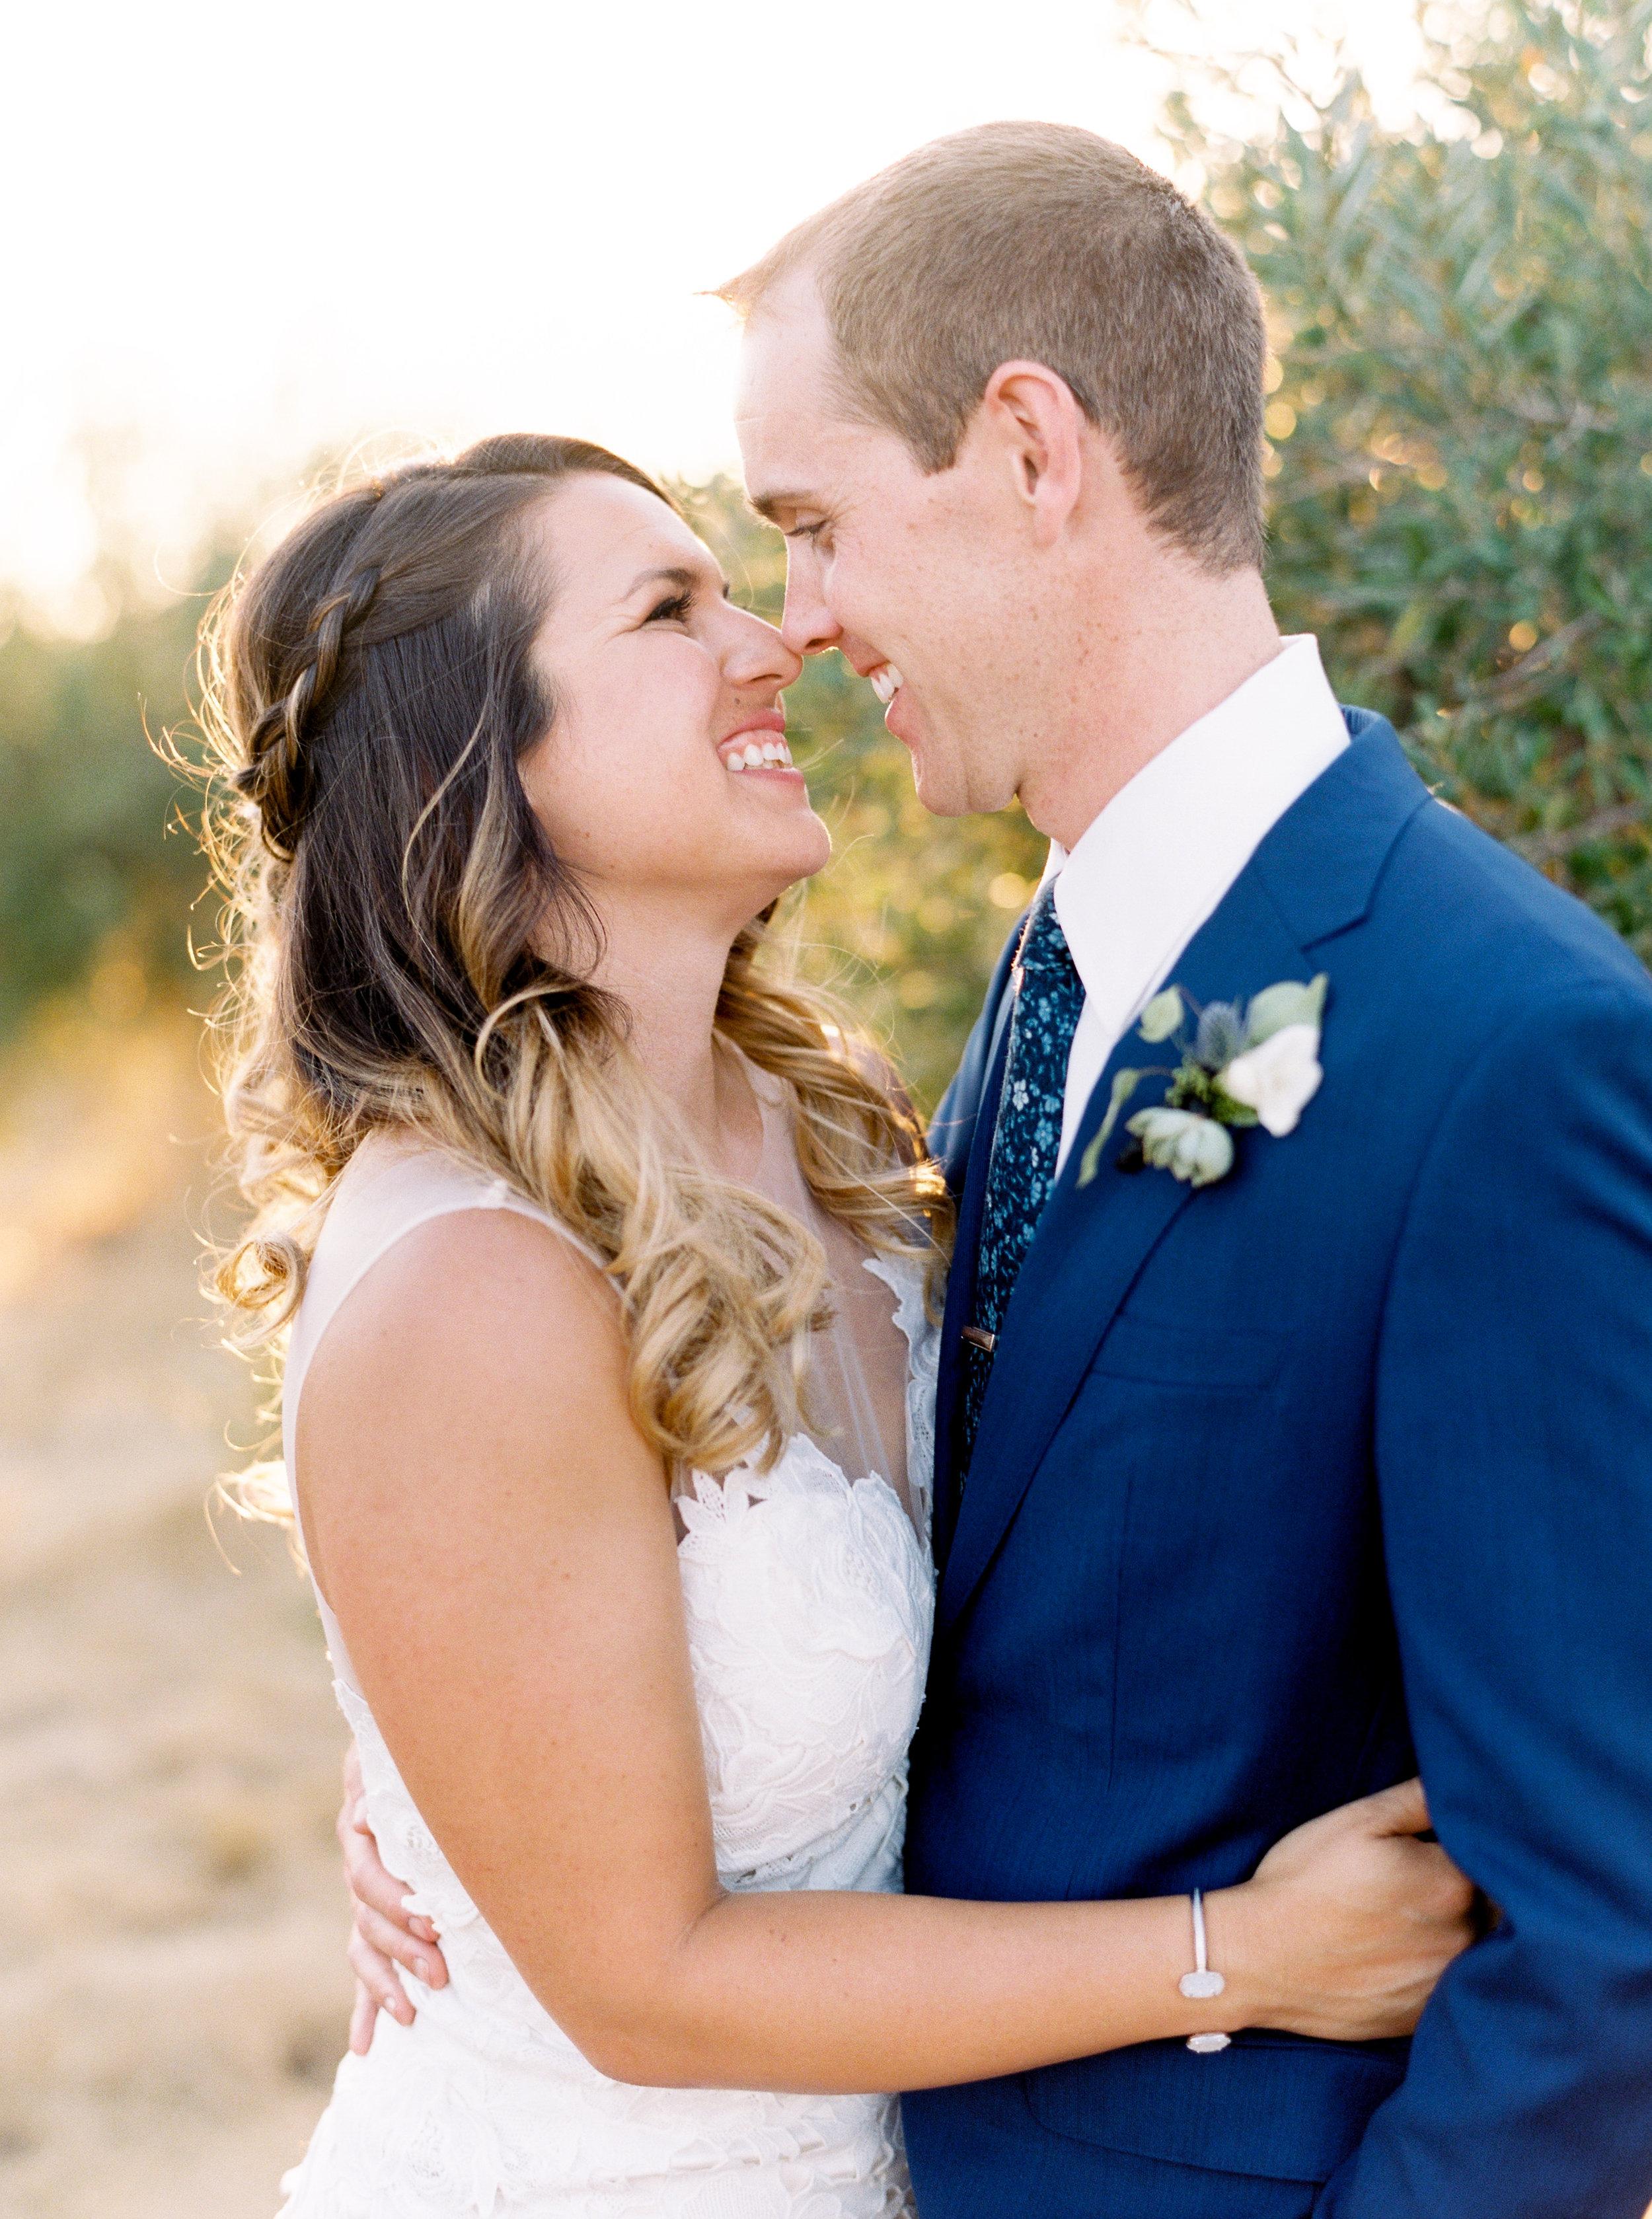 the-purple-orchid-resort-wedding-in-livermore-california-179.jpg